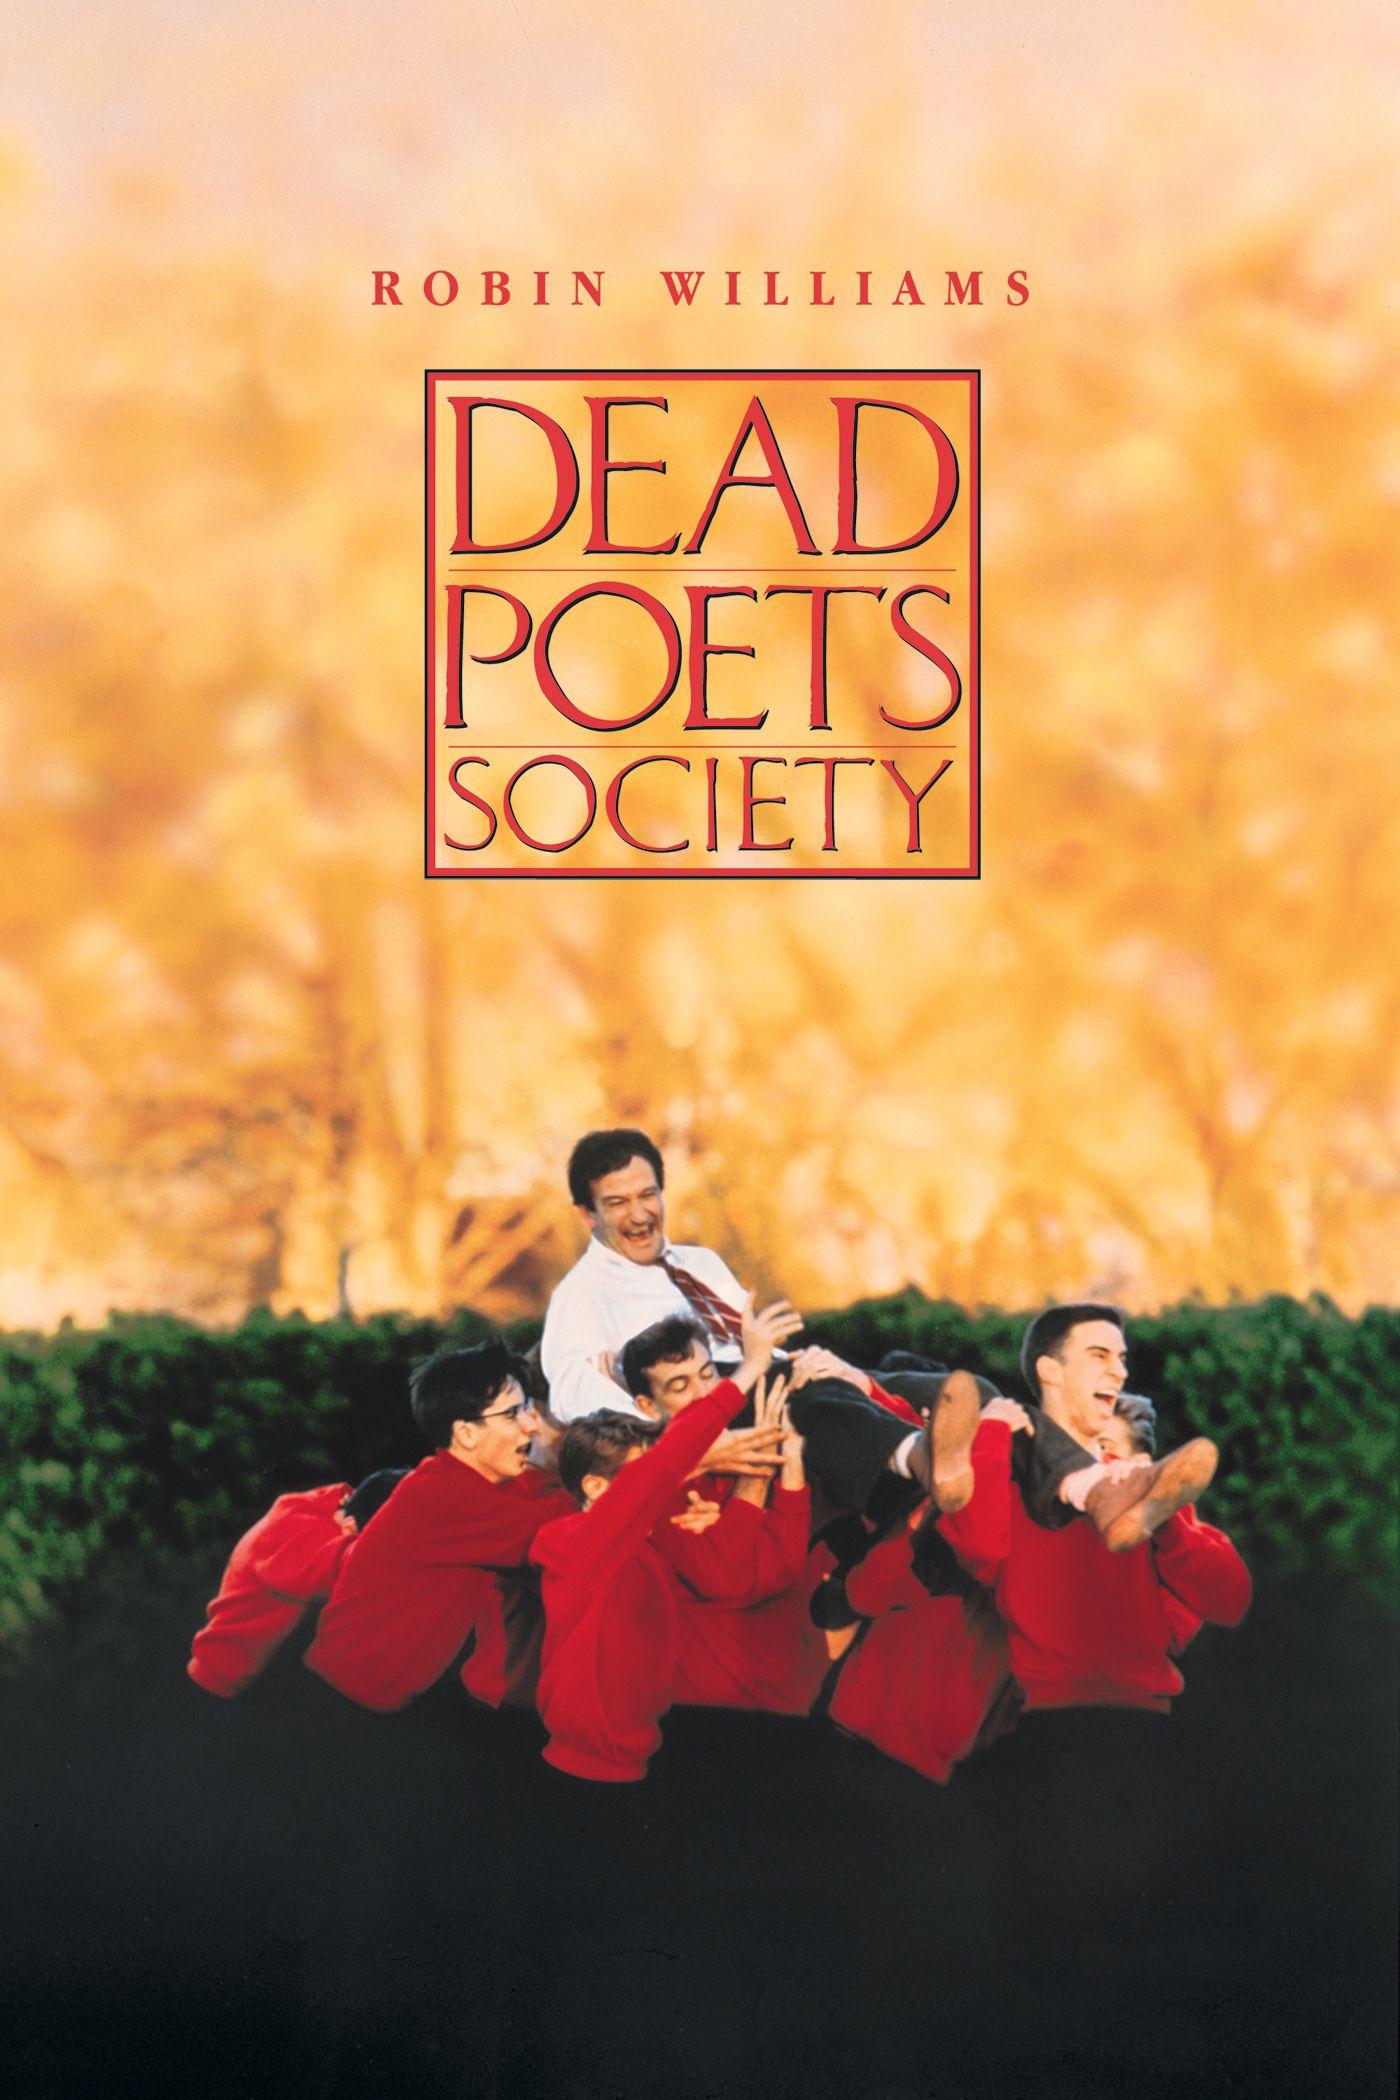 dead poets society full movie free